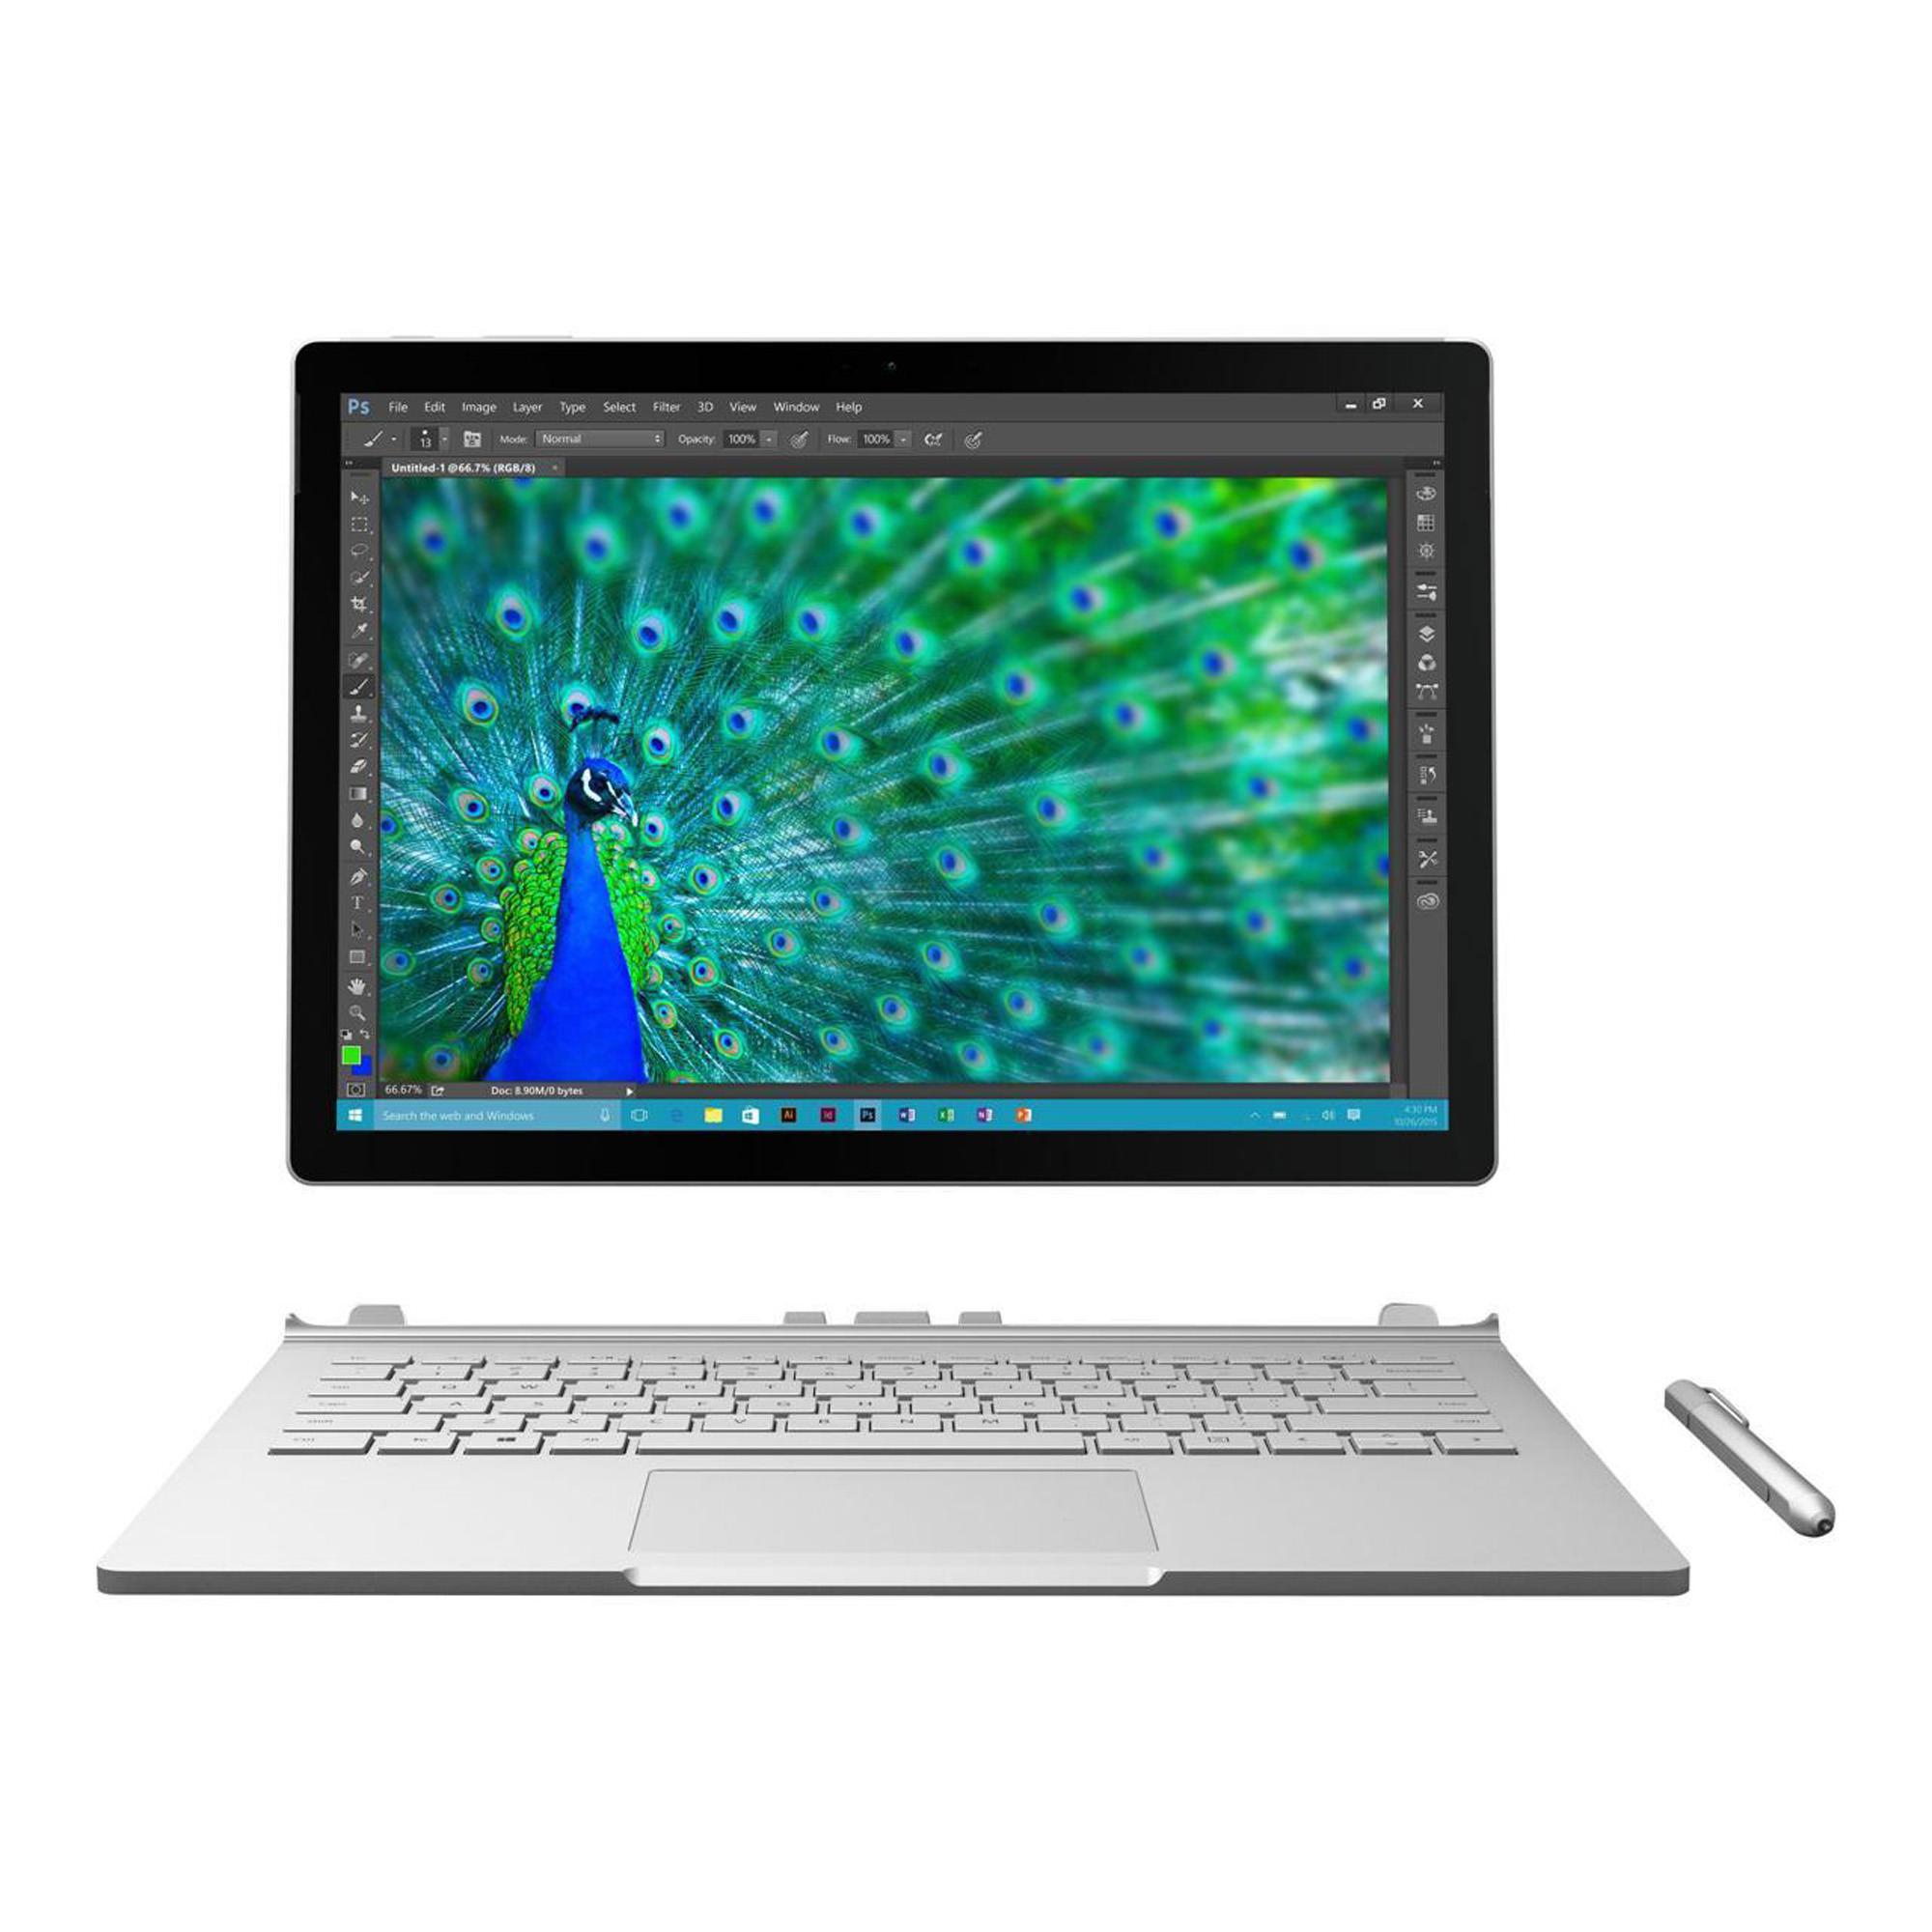 Microsoft 9ER-00001 Surface Book, 8GB Memory, 256GB HDD, Intel Core i7-6600U, NVIDIA GeForce graphics, Silver, Windows 10 Professional